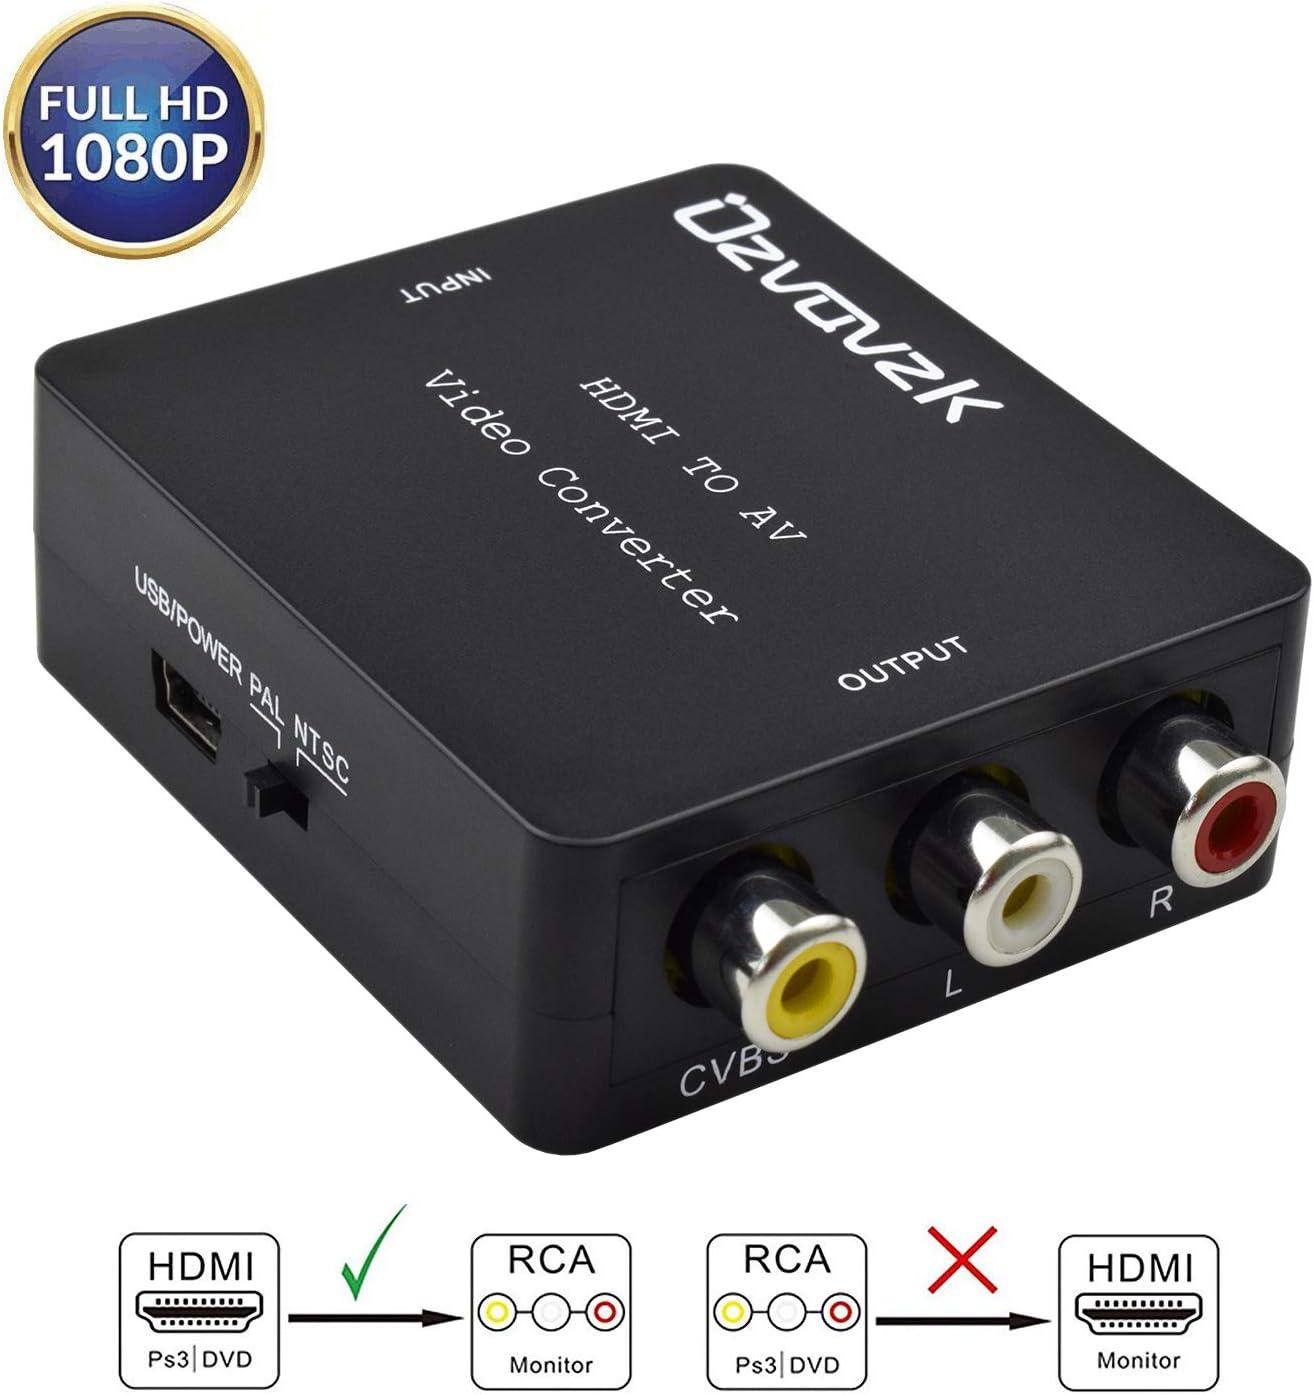 Ozvavzk HDMI a AV,HDMI a RCA Adaptador Compuesto HDMI Audio Vídeo Convertidor Soporte PAL/NTSC Formato de TV Interruptor